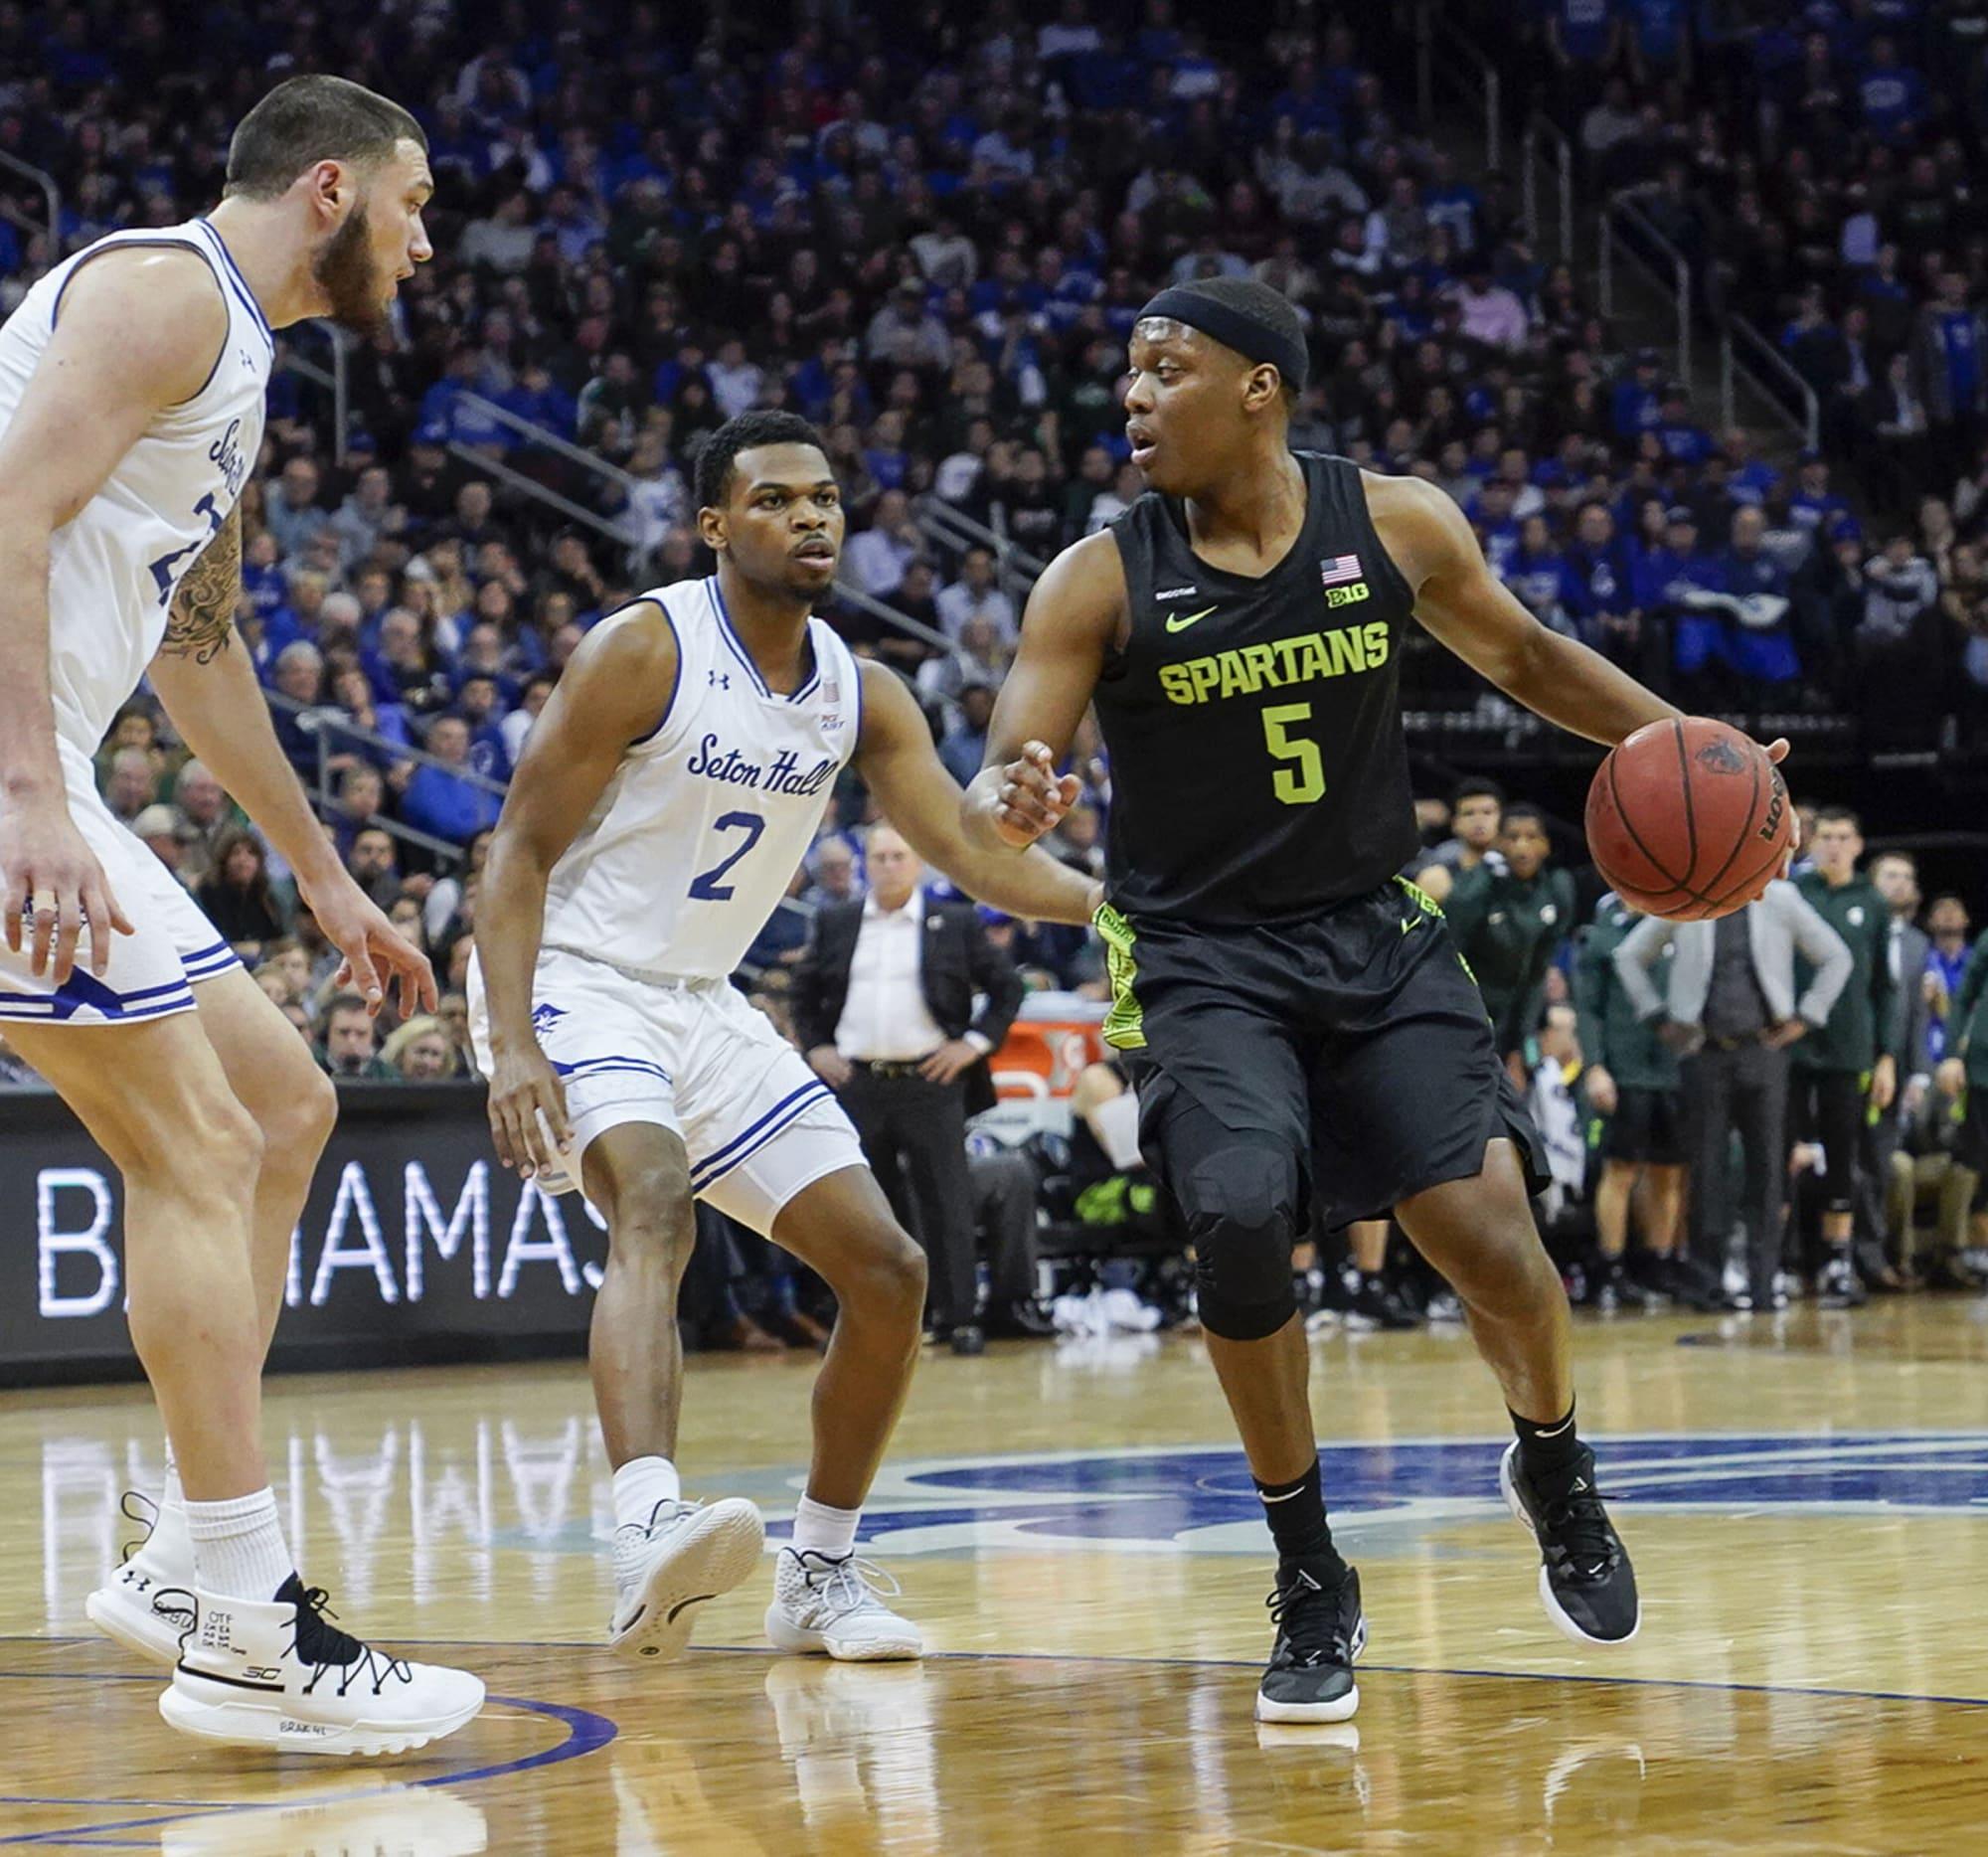 NCAA Basketball: Best games from 2019-20 season – Michigan State vs. Seton Hall